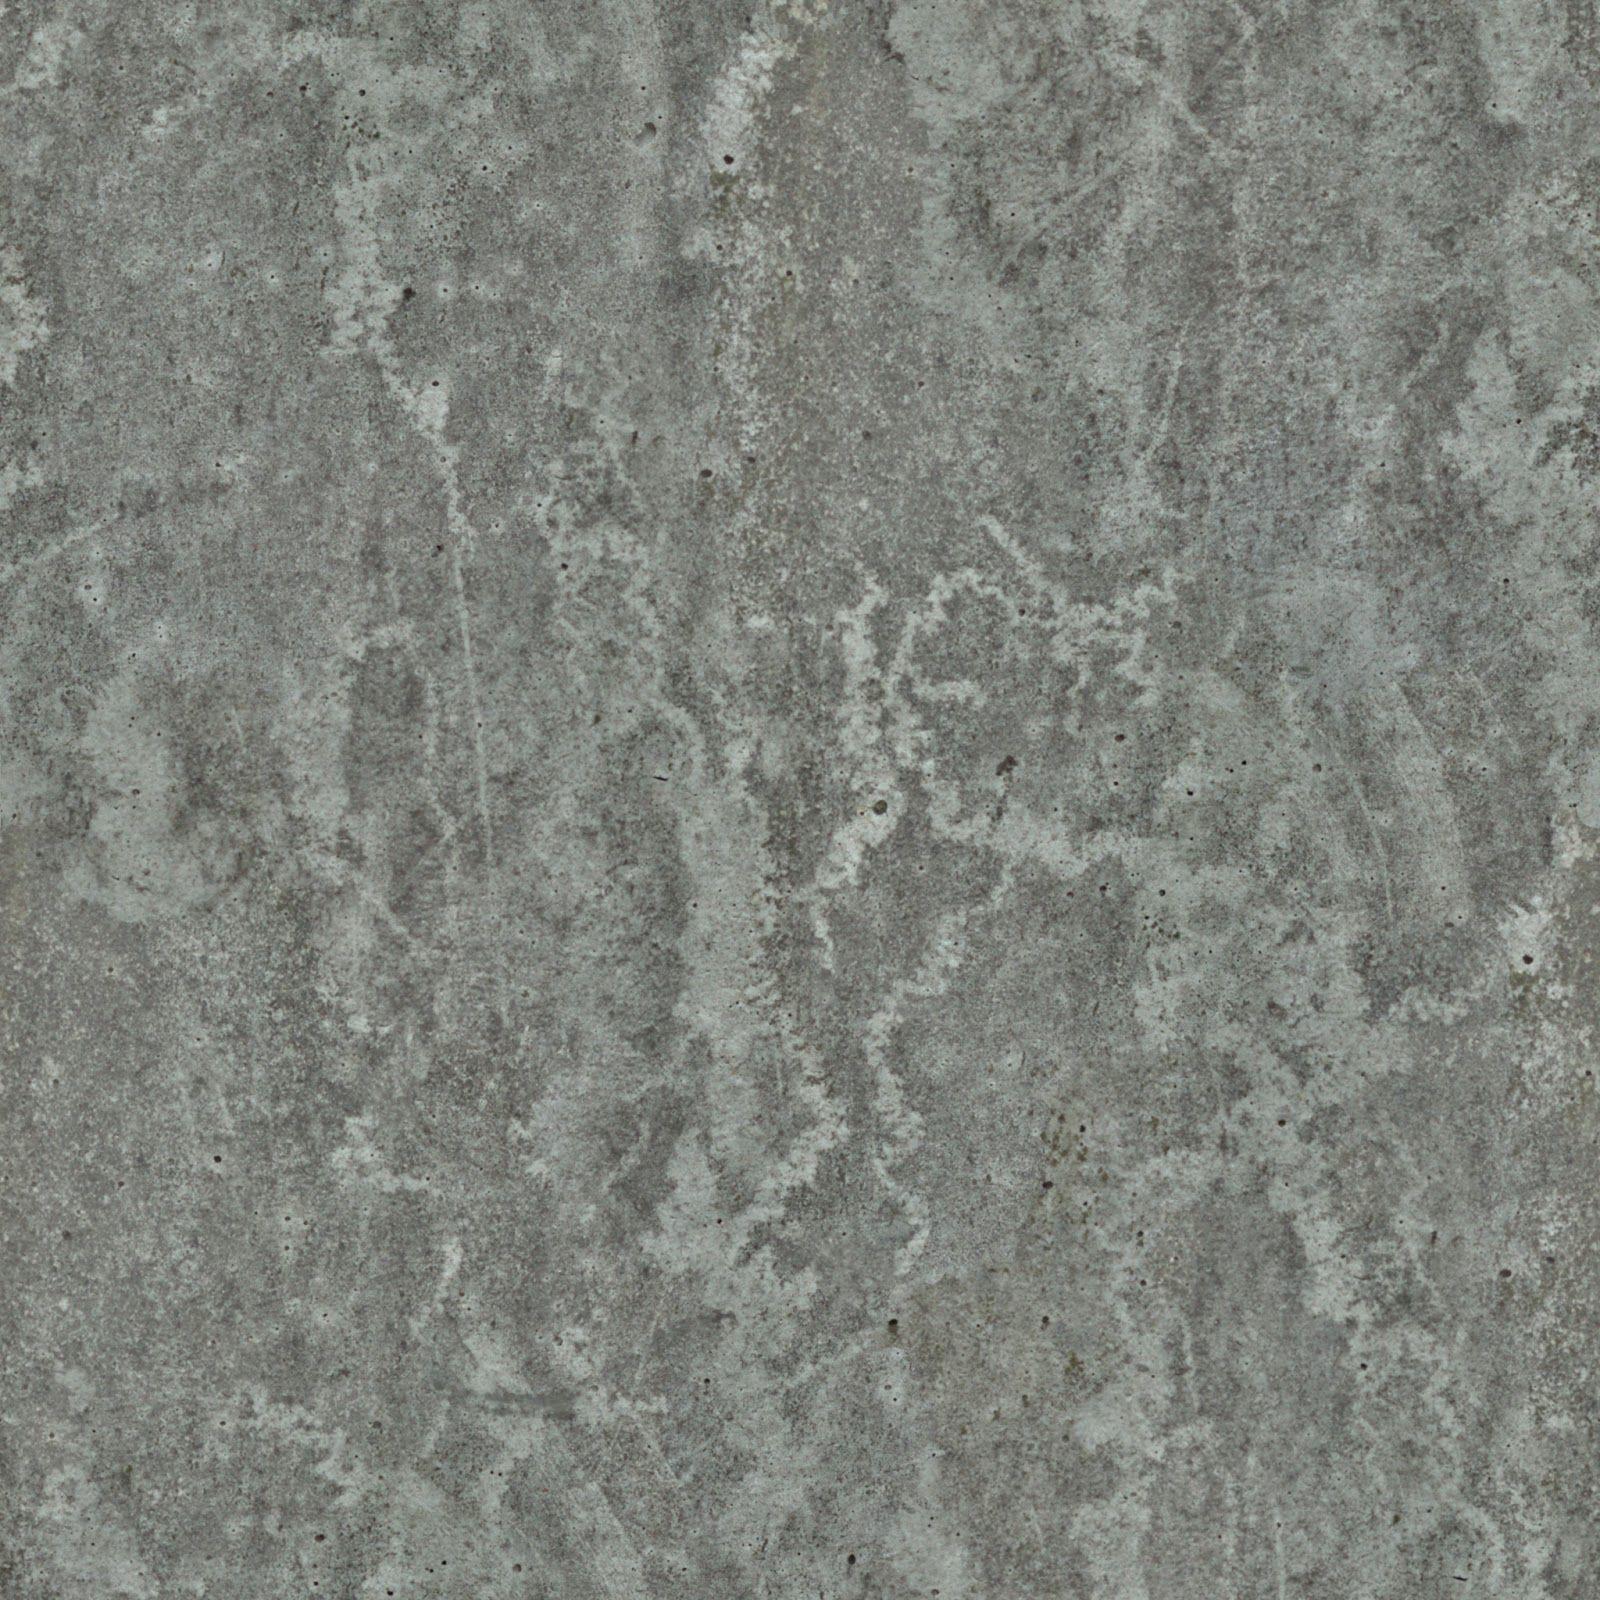 Textures architecture roads roads dirt road texture seamless -  Concrete 5 Wall Smooth Dirt Pillar Seamless Texture 2048x2048